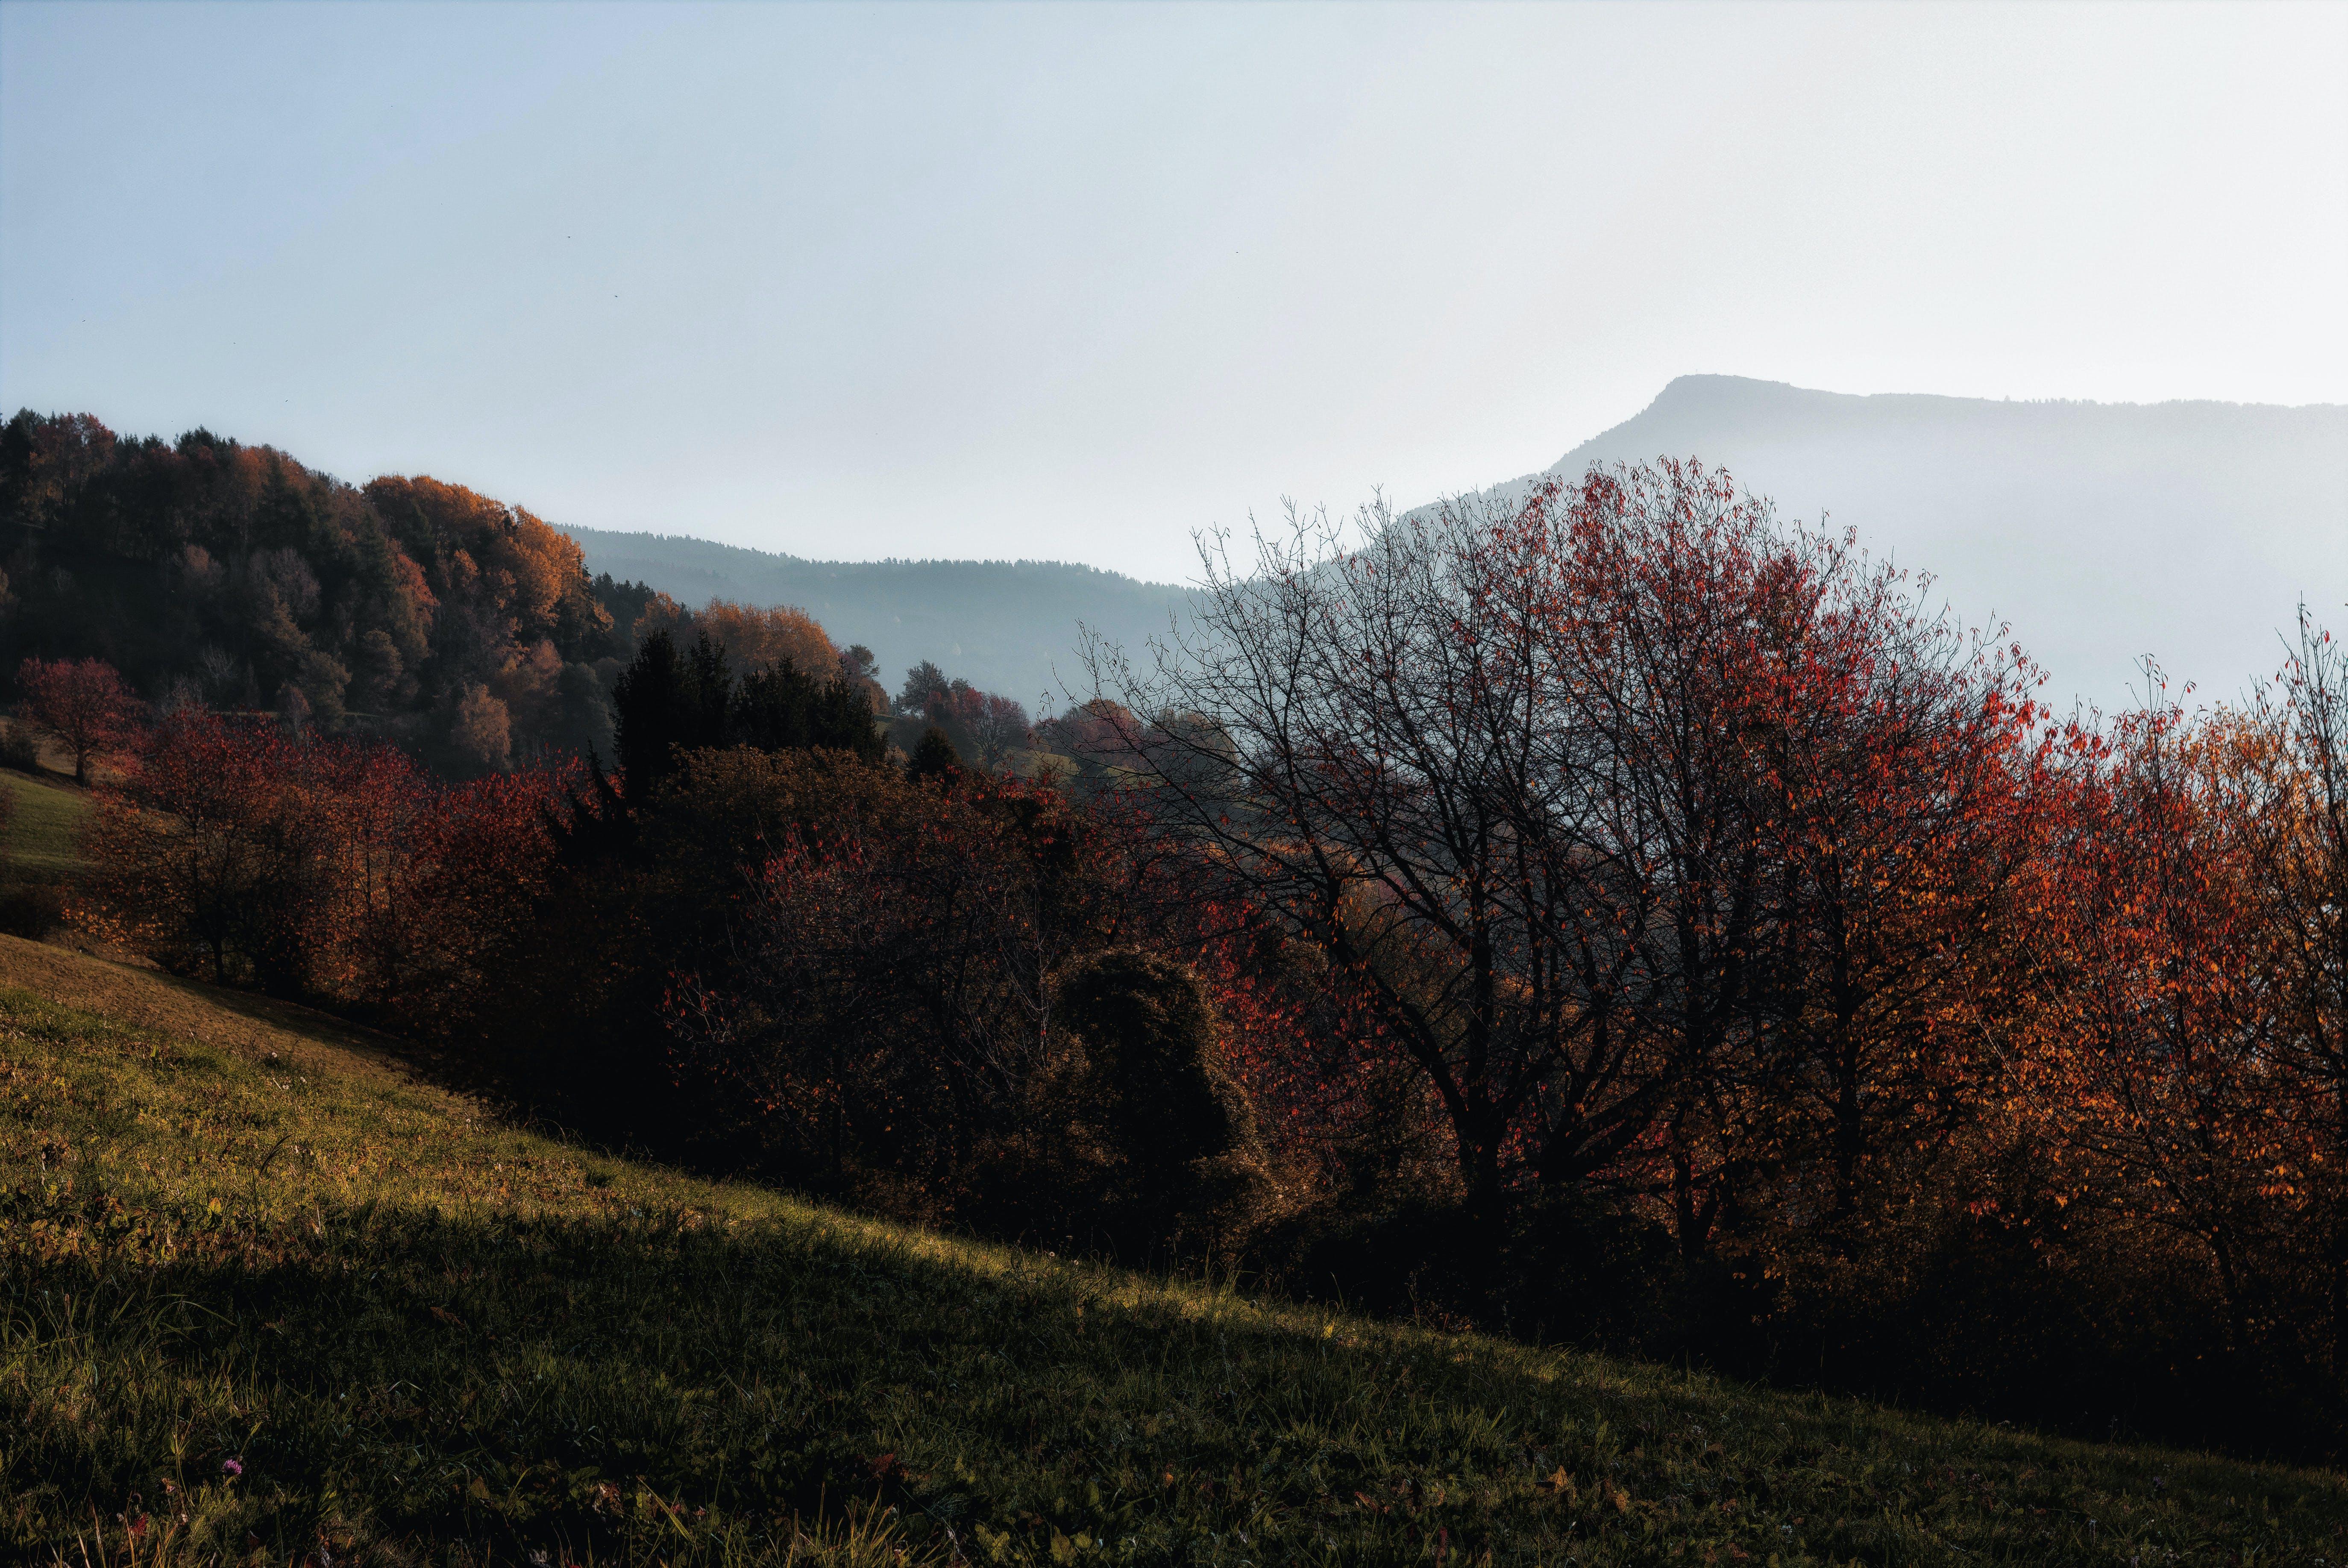 Gratis arkivbilde med daggry, dagslys, fjell, gress